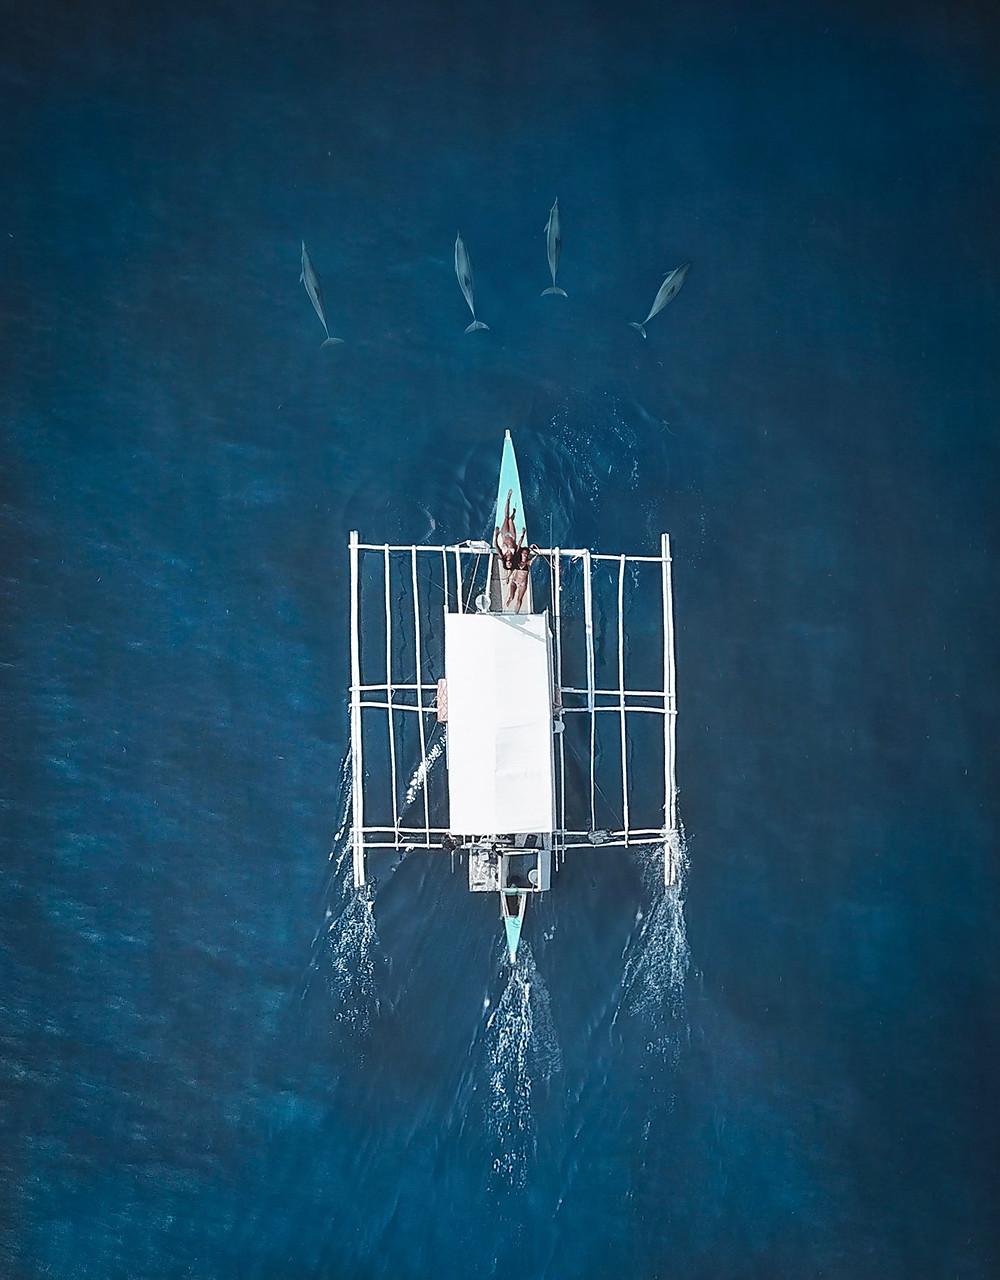 Dolphin Watching and Manjuyod Sandbar | On Airplane Mode